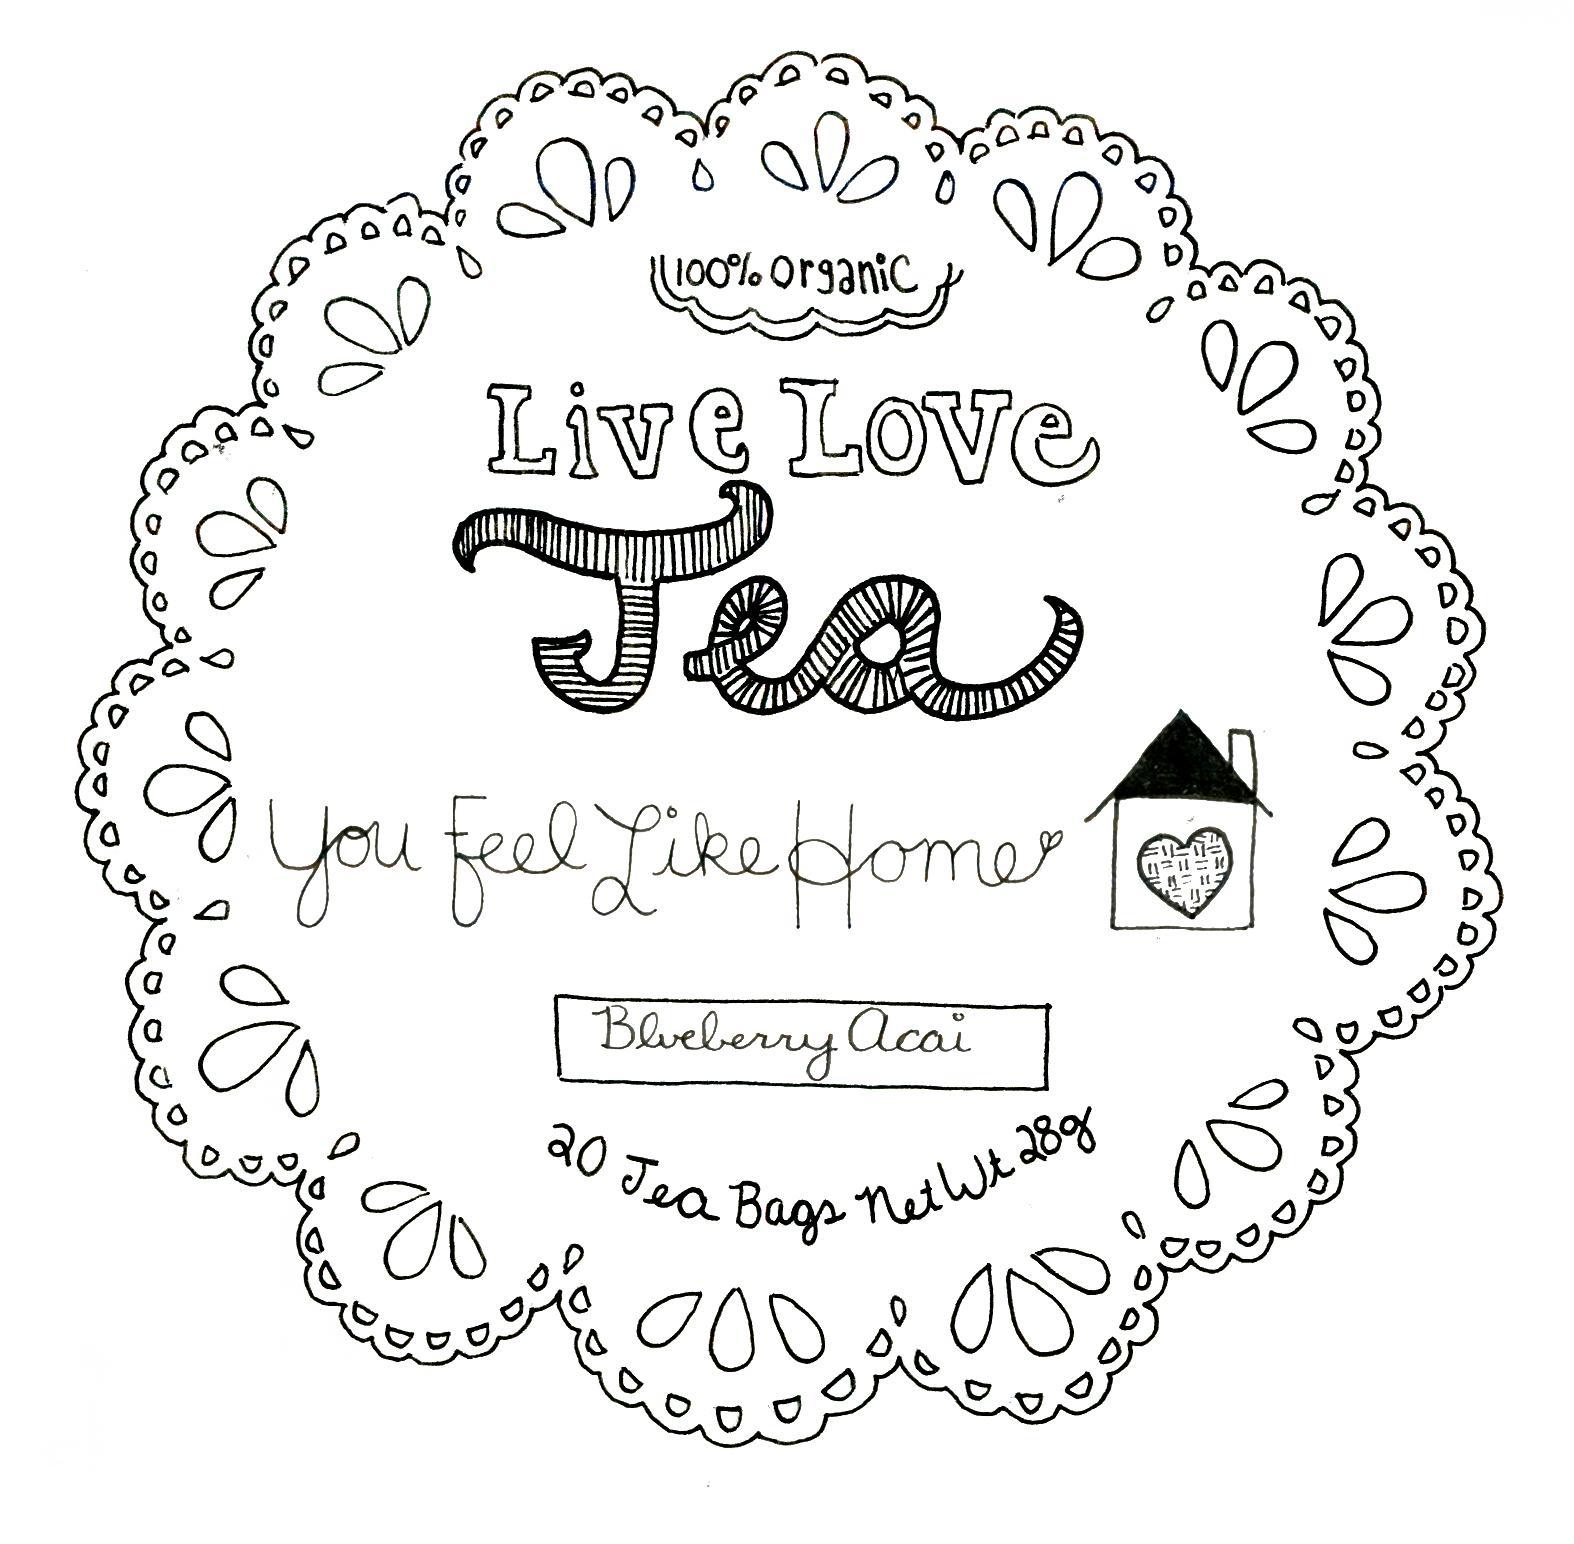 Live.Love.Tea. - image 18 - student project